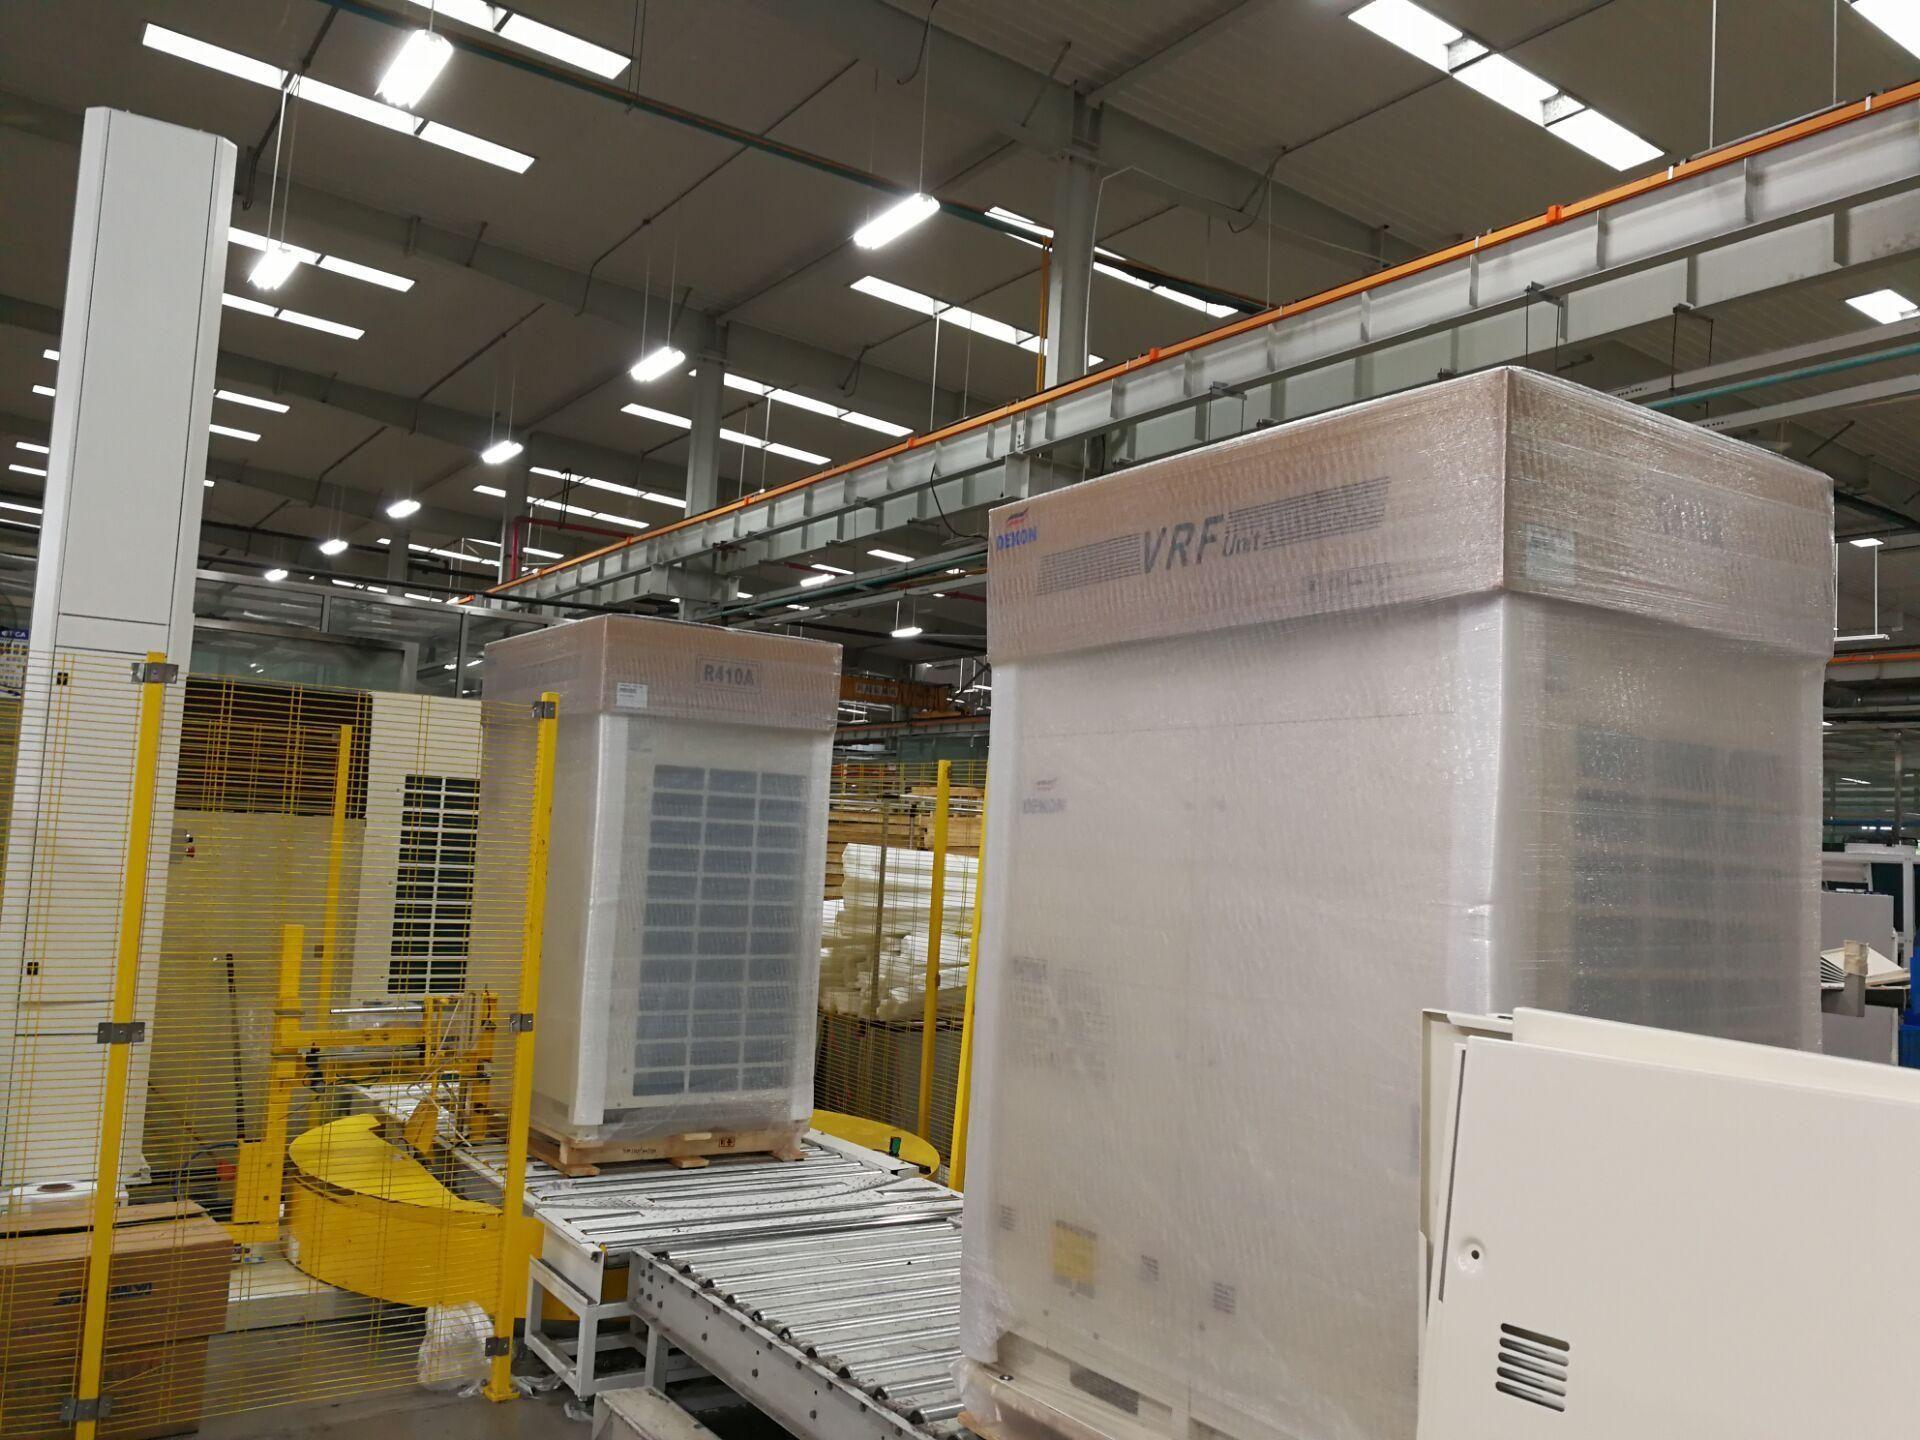 DEKON VRF Outdoor unit, china best factory for VRF System